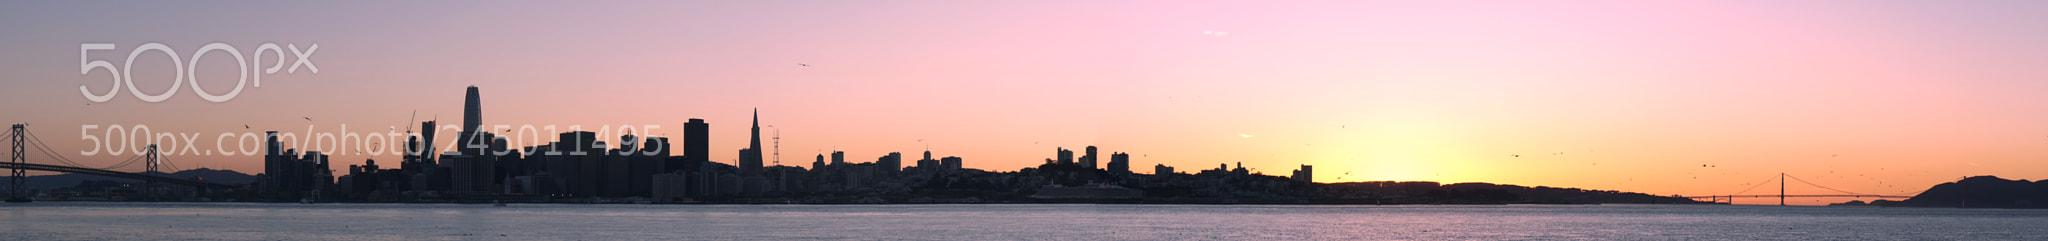 SF Skyline #2